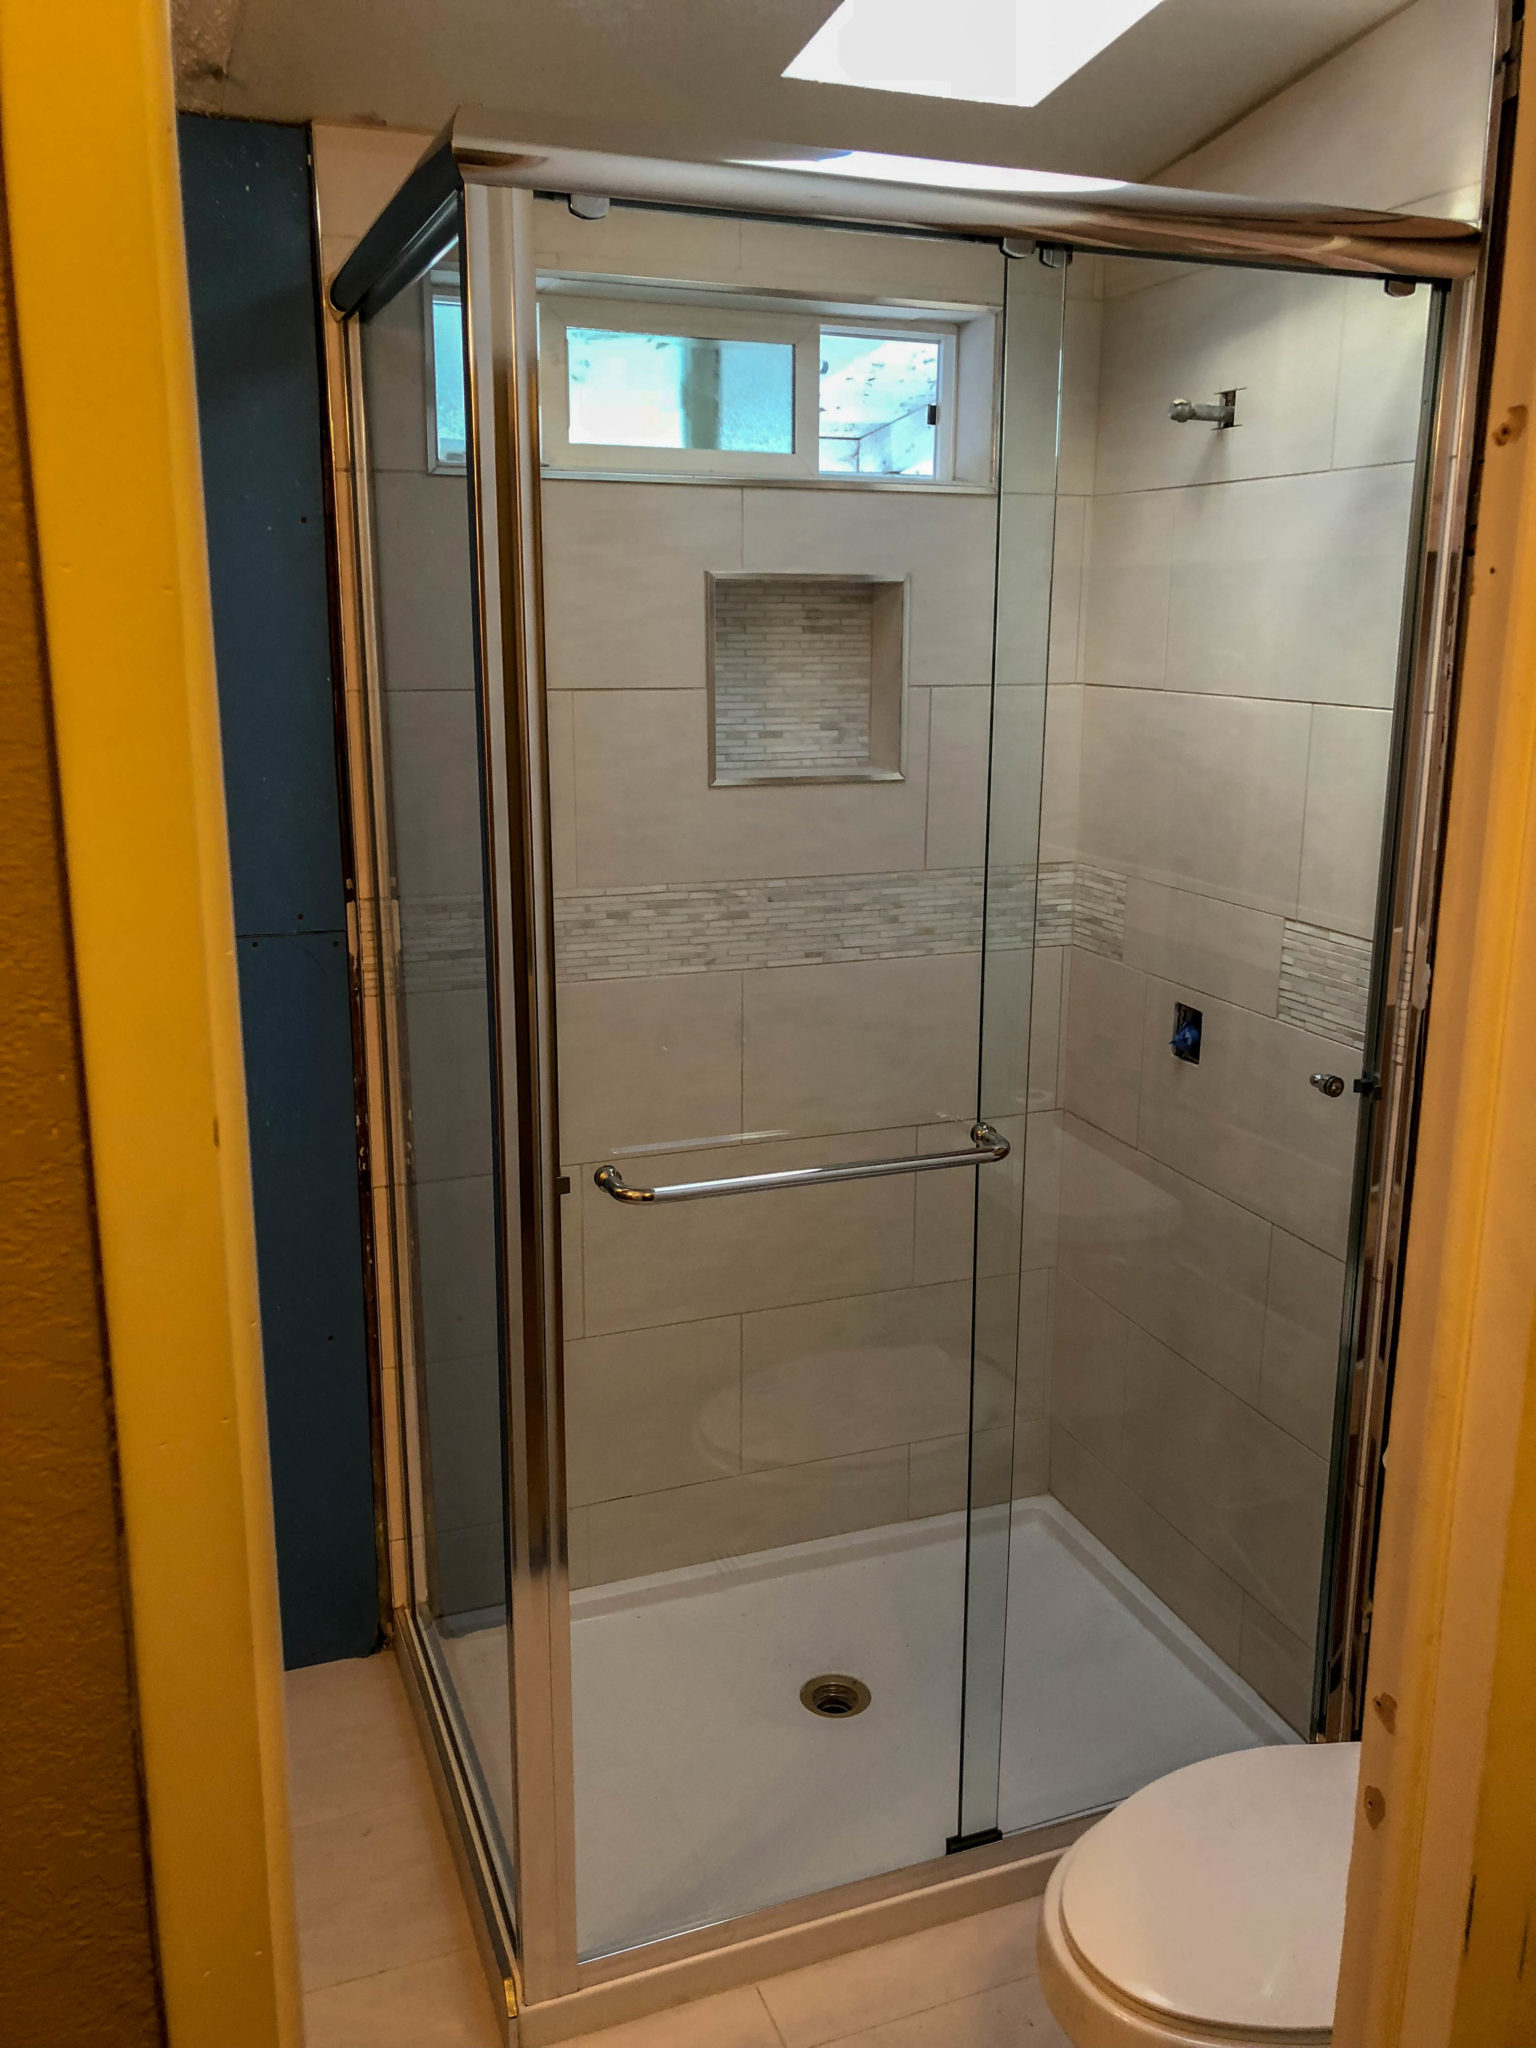 glass shower enclosure - kona glass hawaii (2)